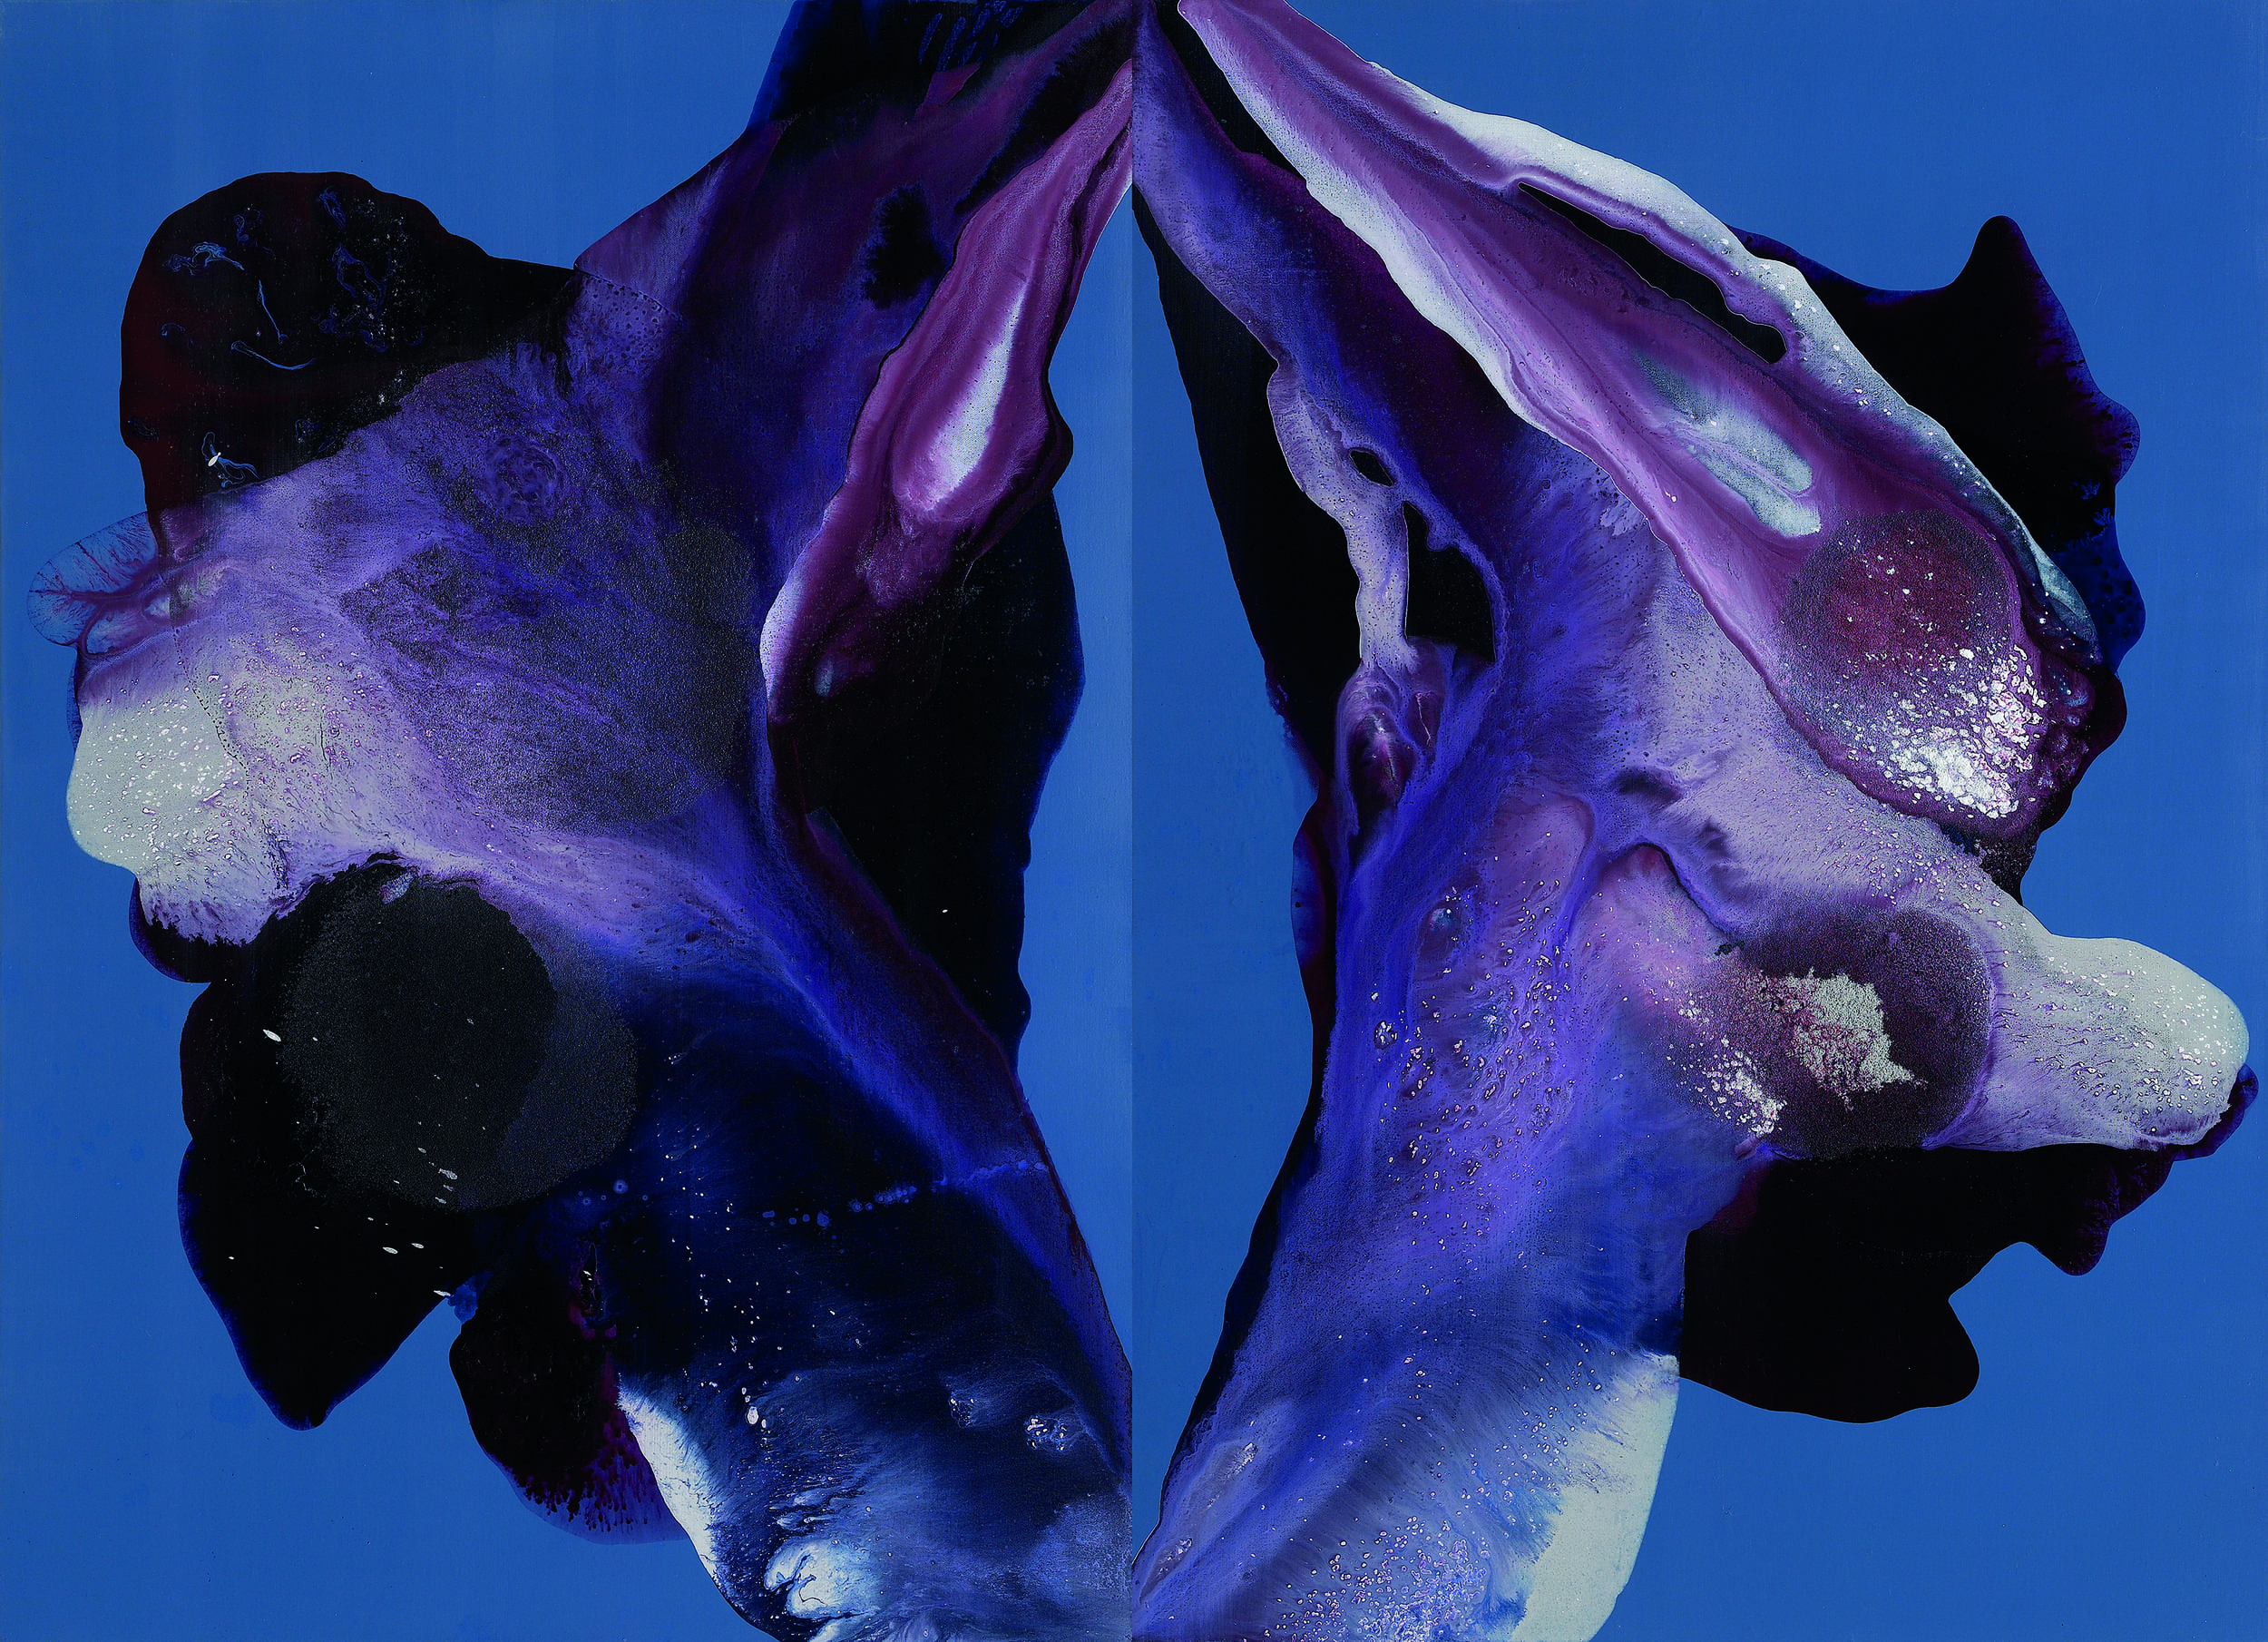 figure_14  acrylic and pumice  gel on canvas  160.6 cm X 116.8 cm  2014